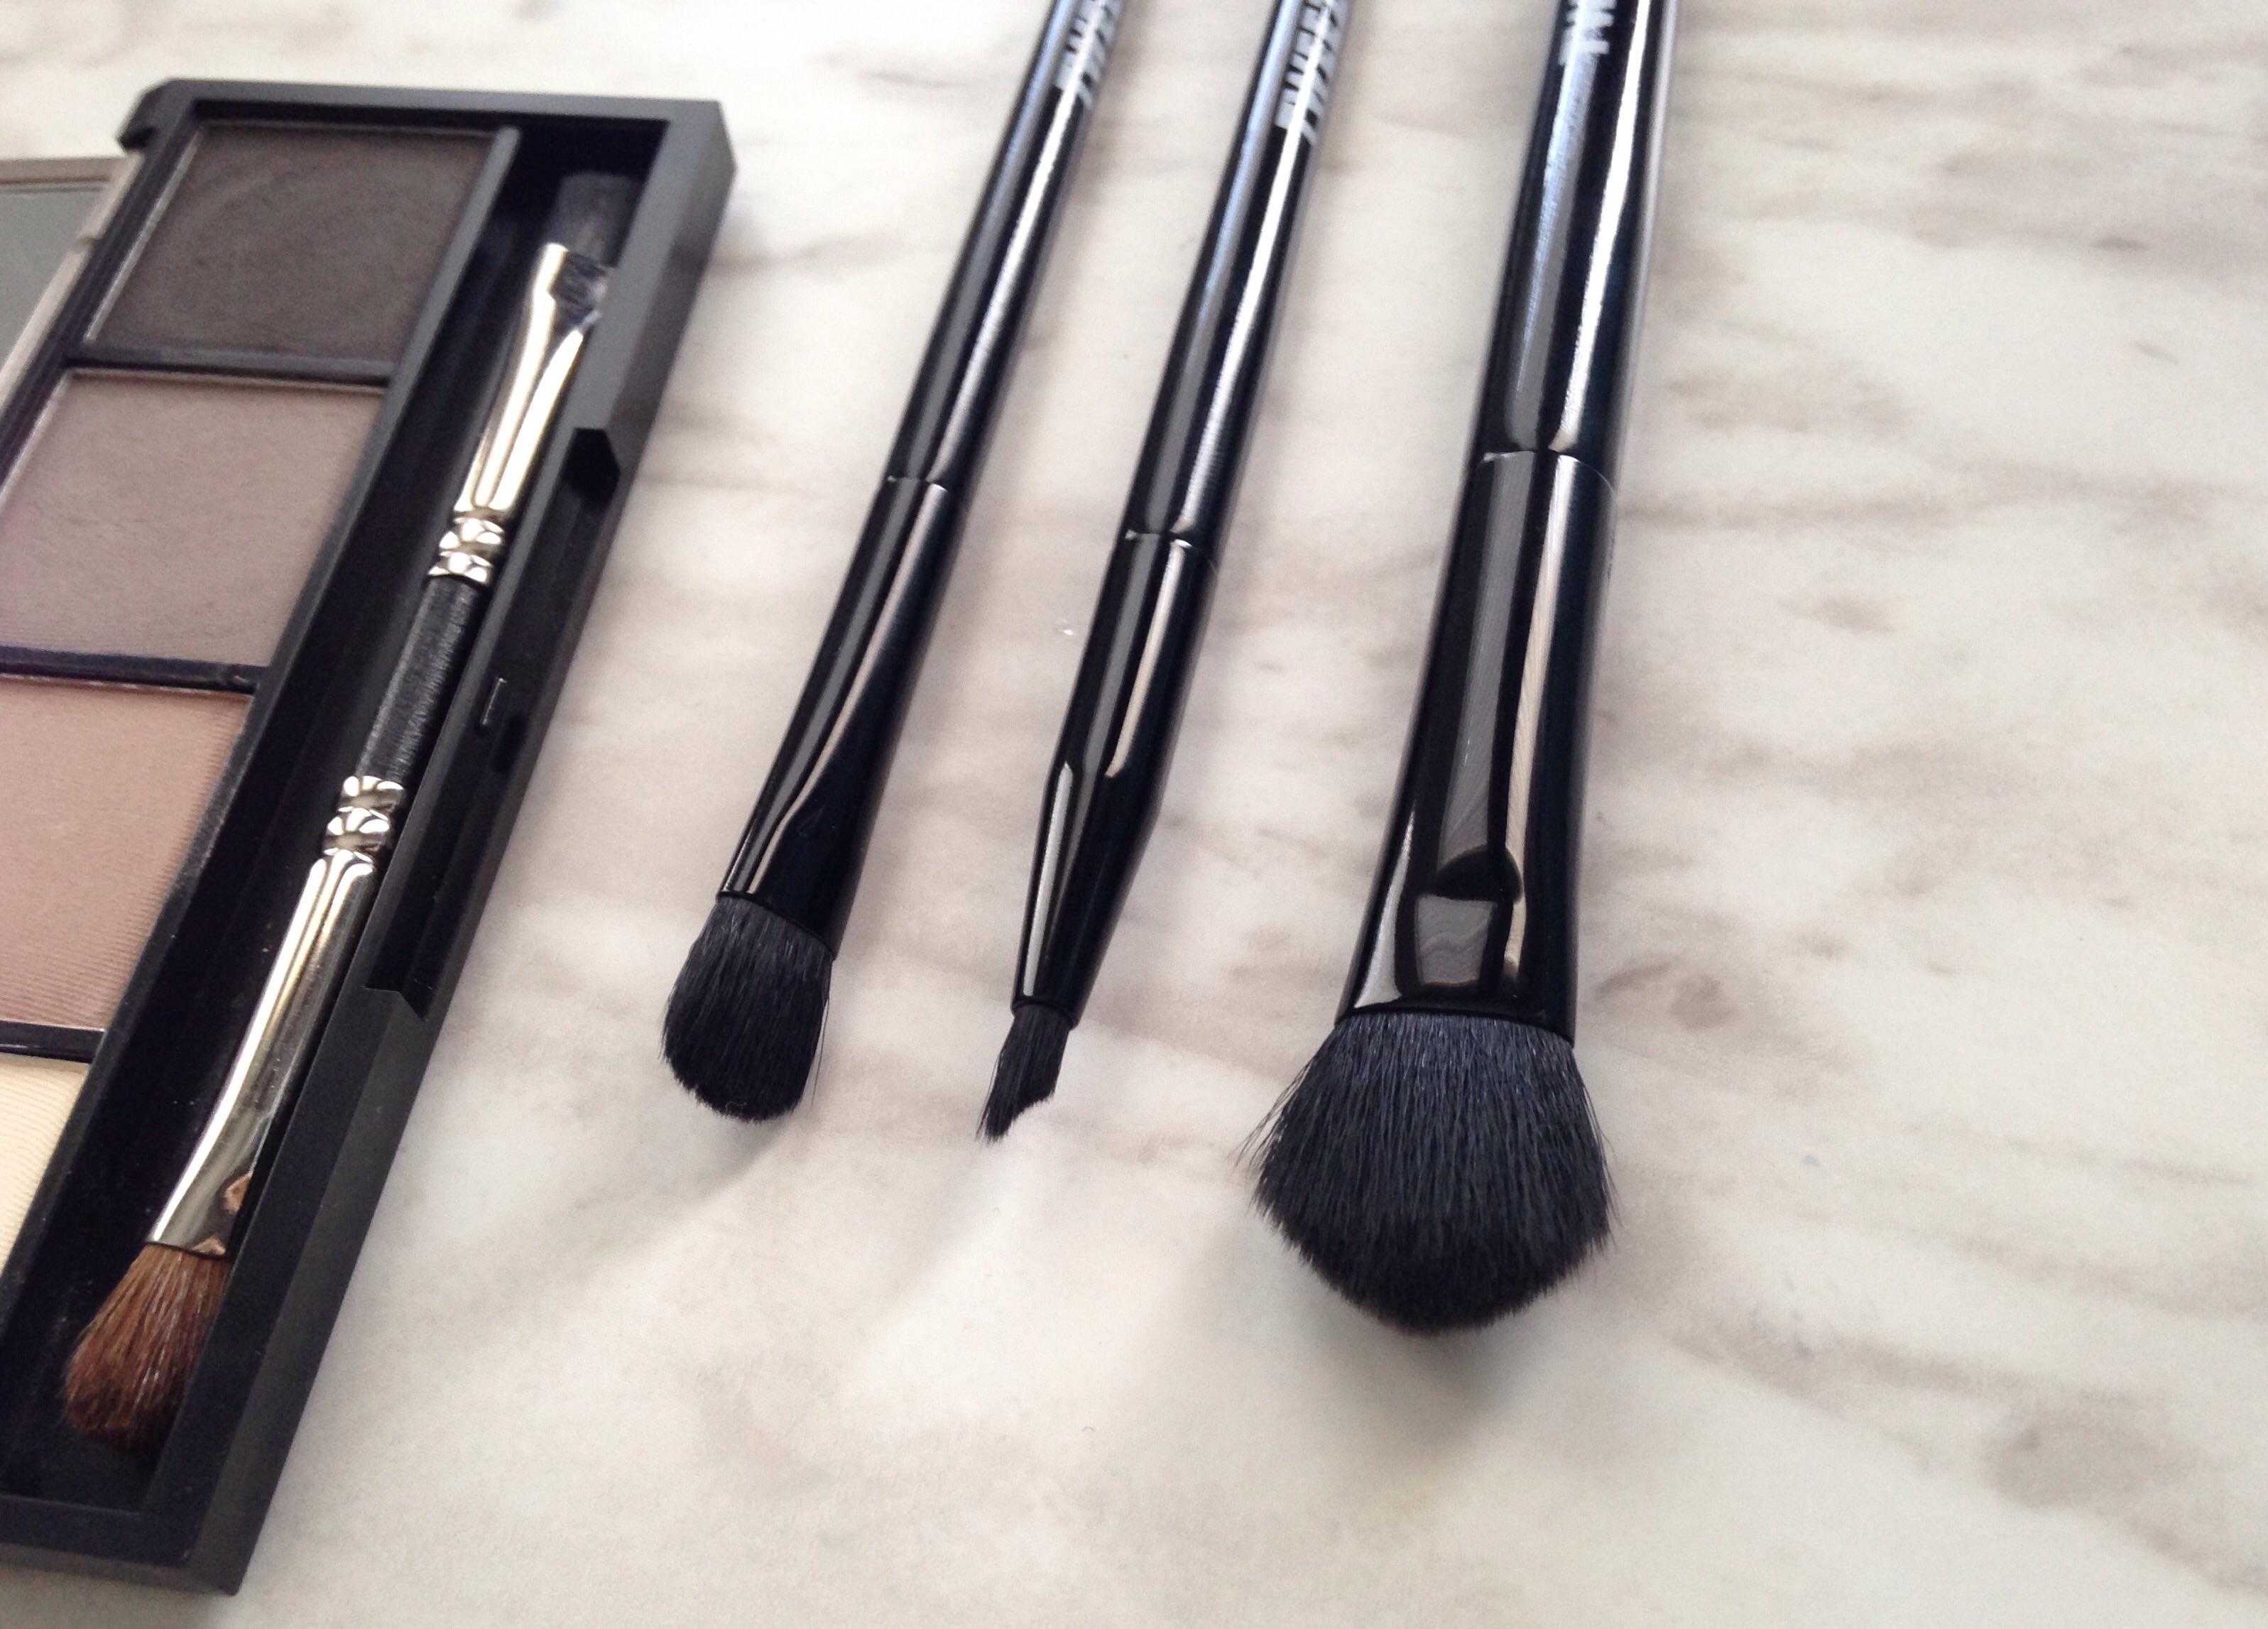 Buy Brush tweezerman iq brushes picture trends